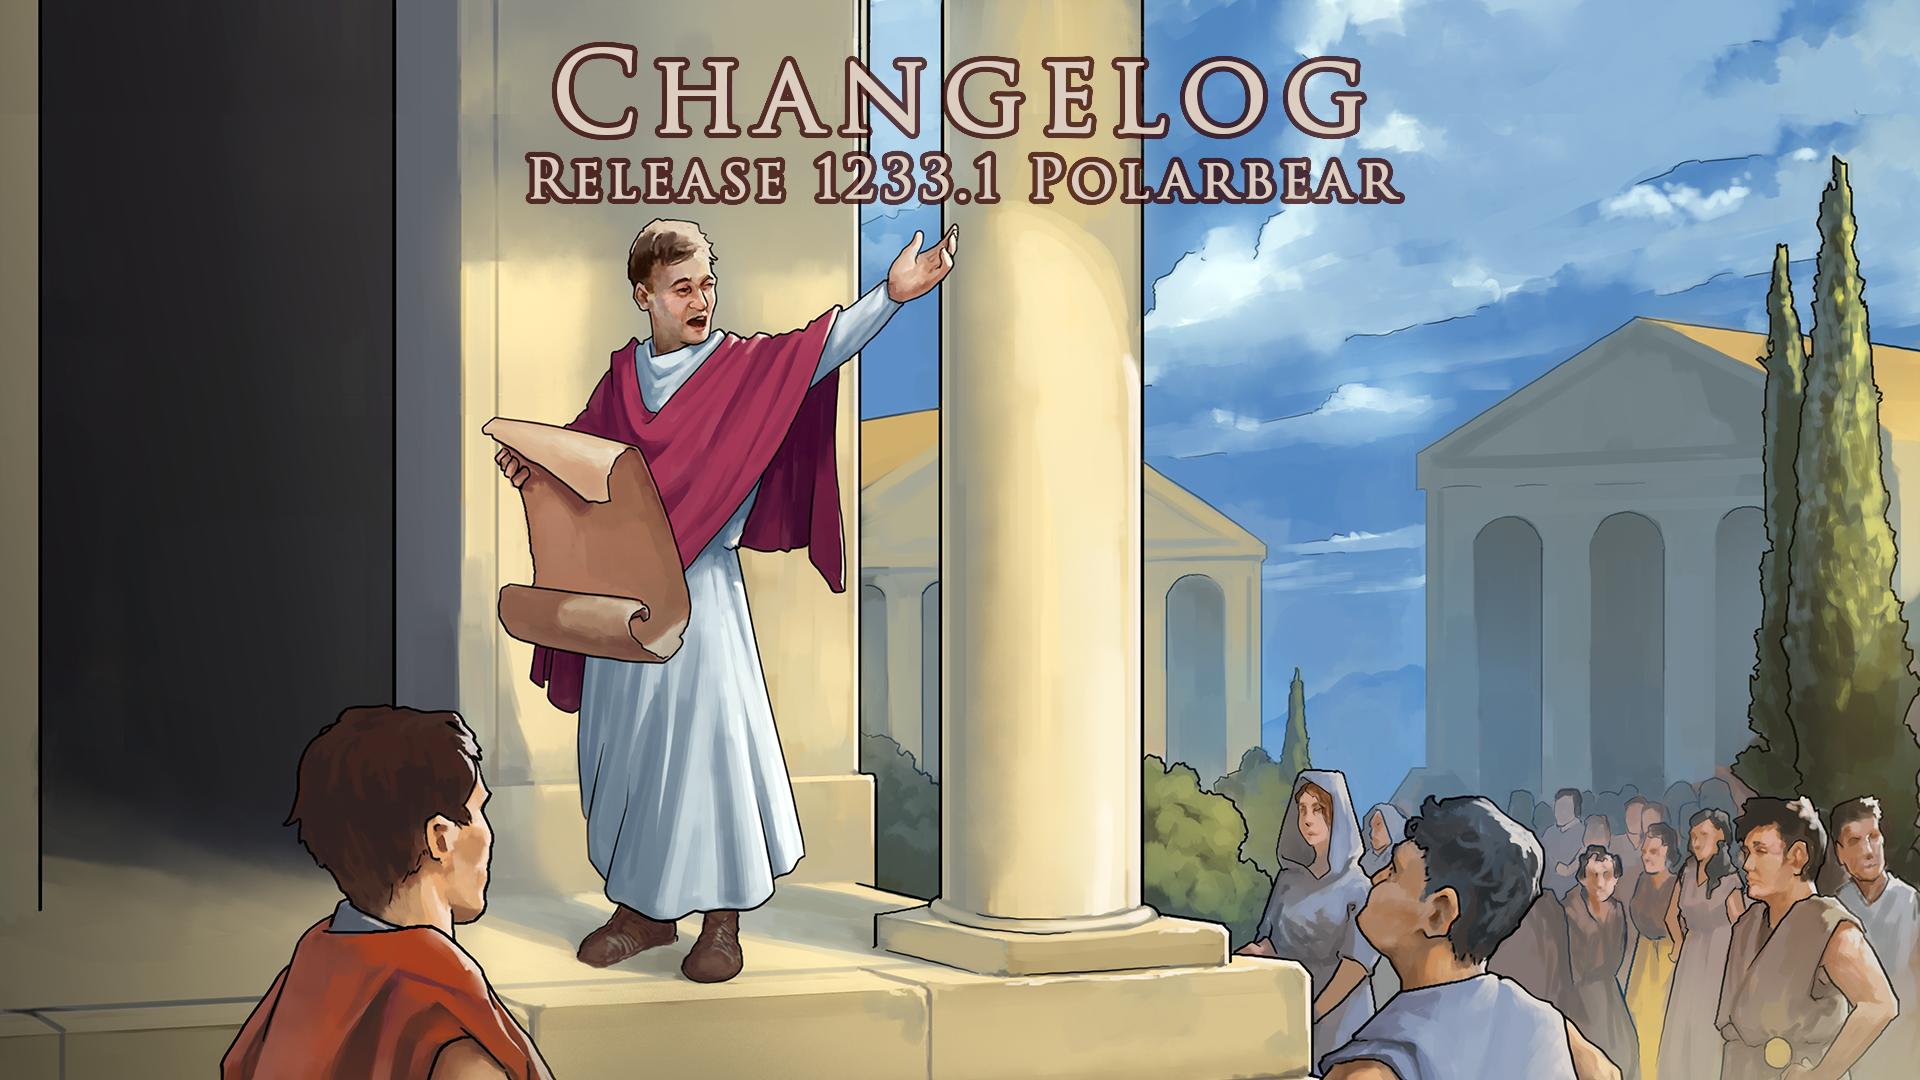 CHANGELOG – Release Polarbear 1233.1